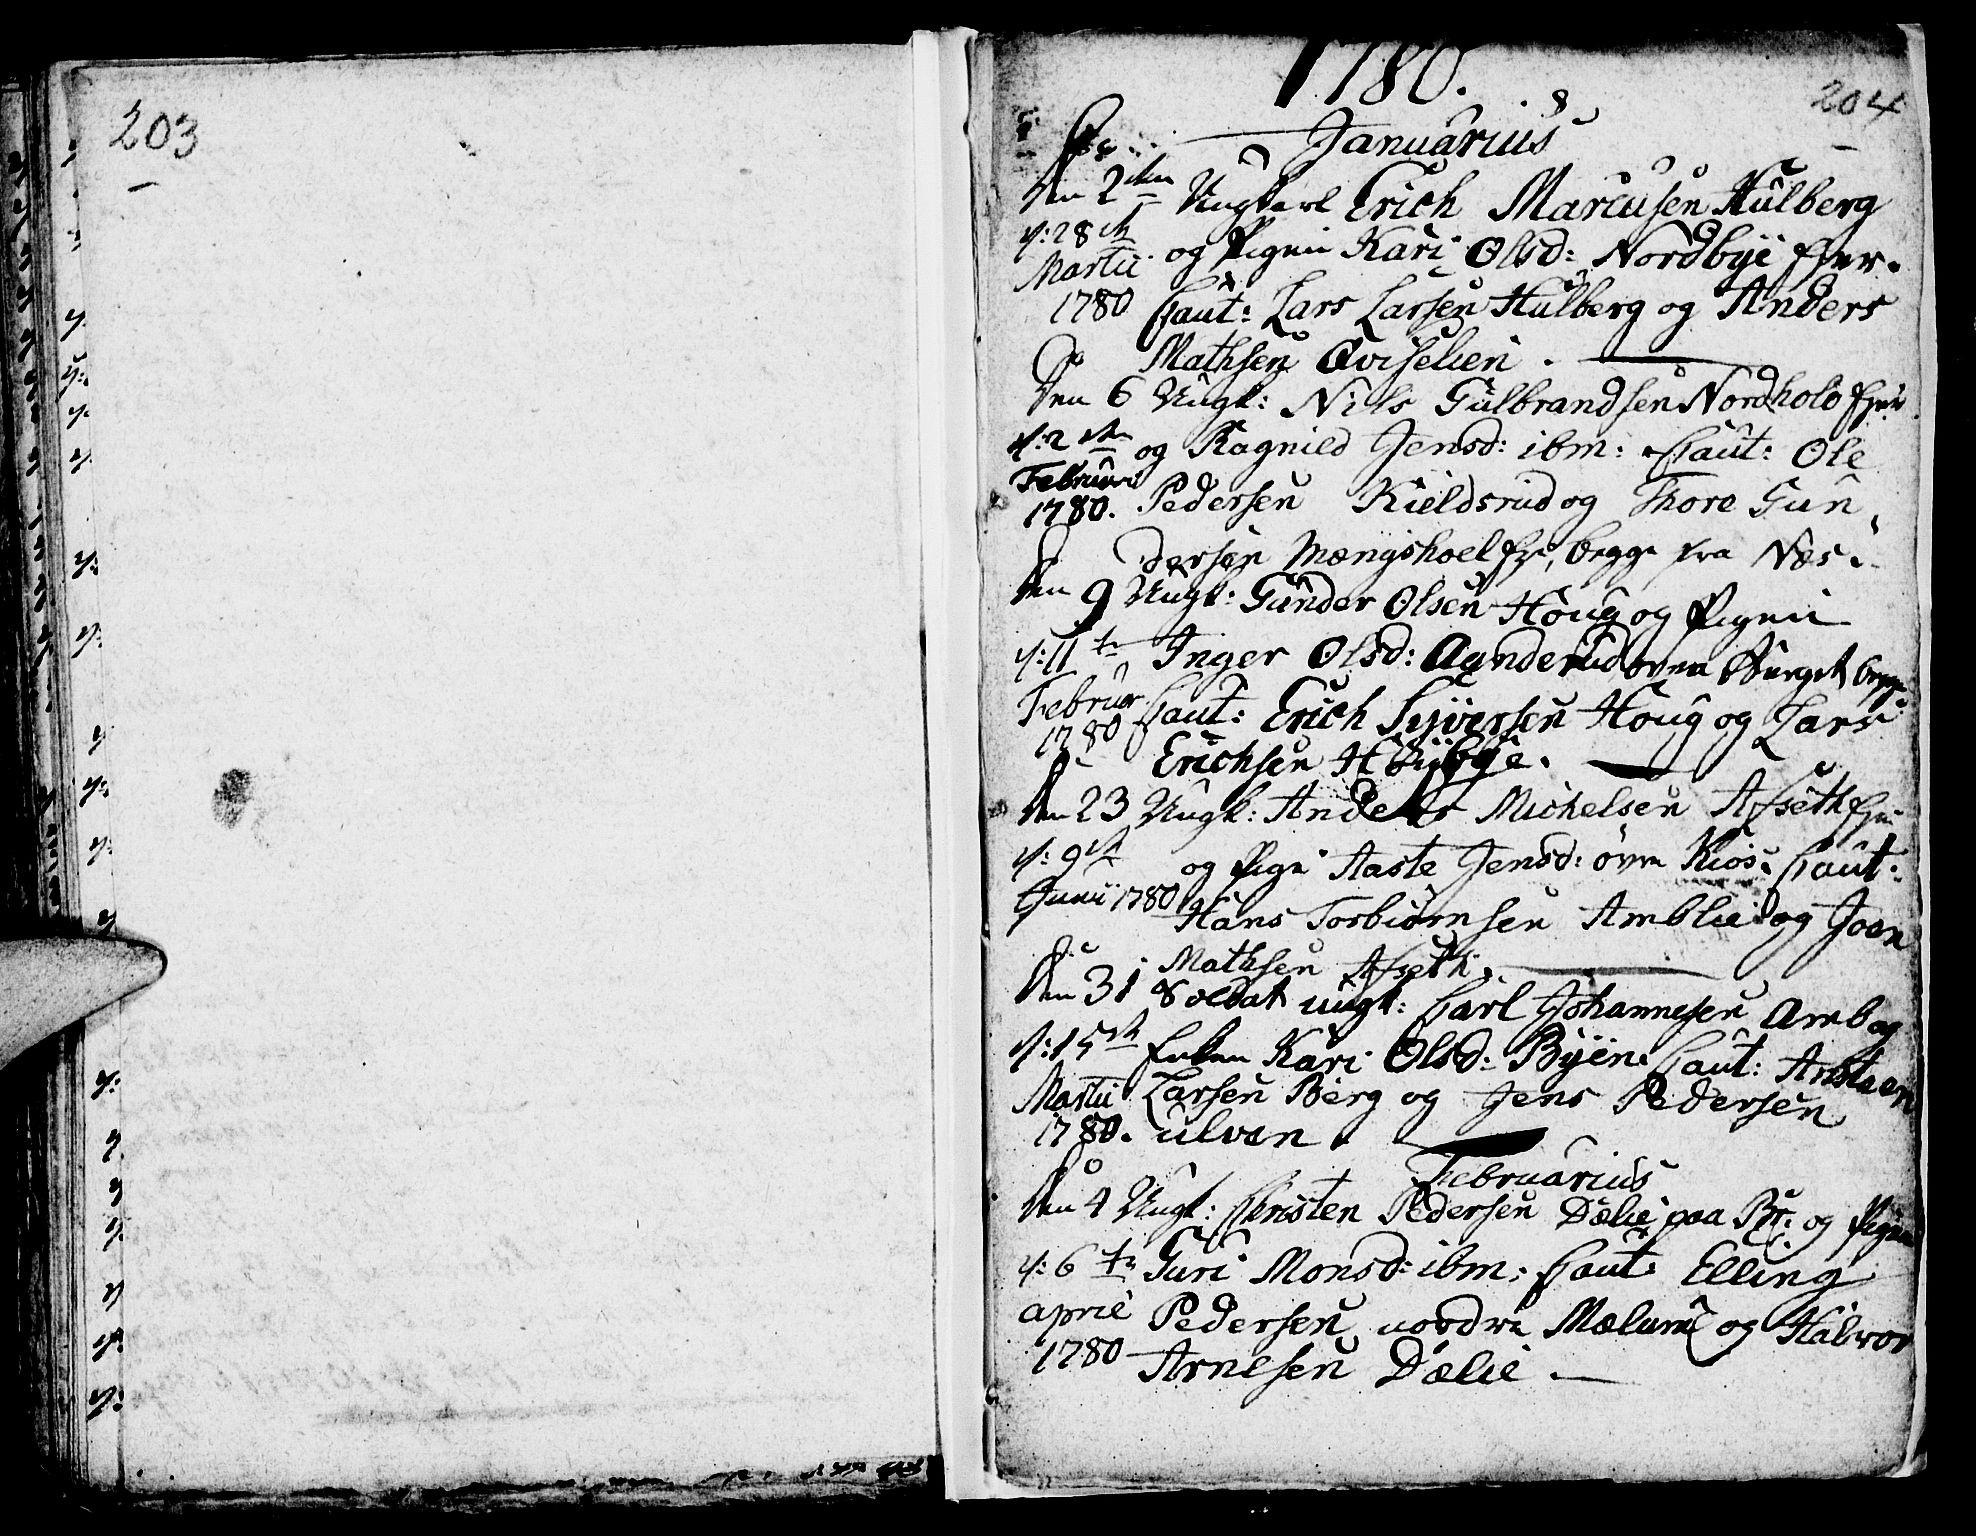 SAH, Ringsaker prestekontor, I/Ia/L0005/0003: Kladd til kirkebok nr. 1C, 1780-1784, s. 203-204